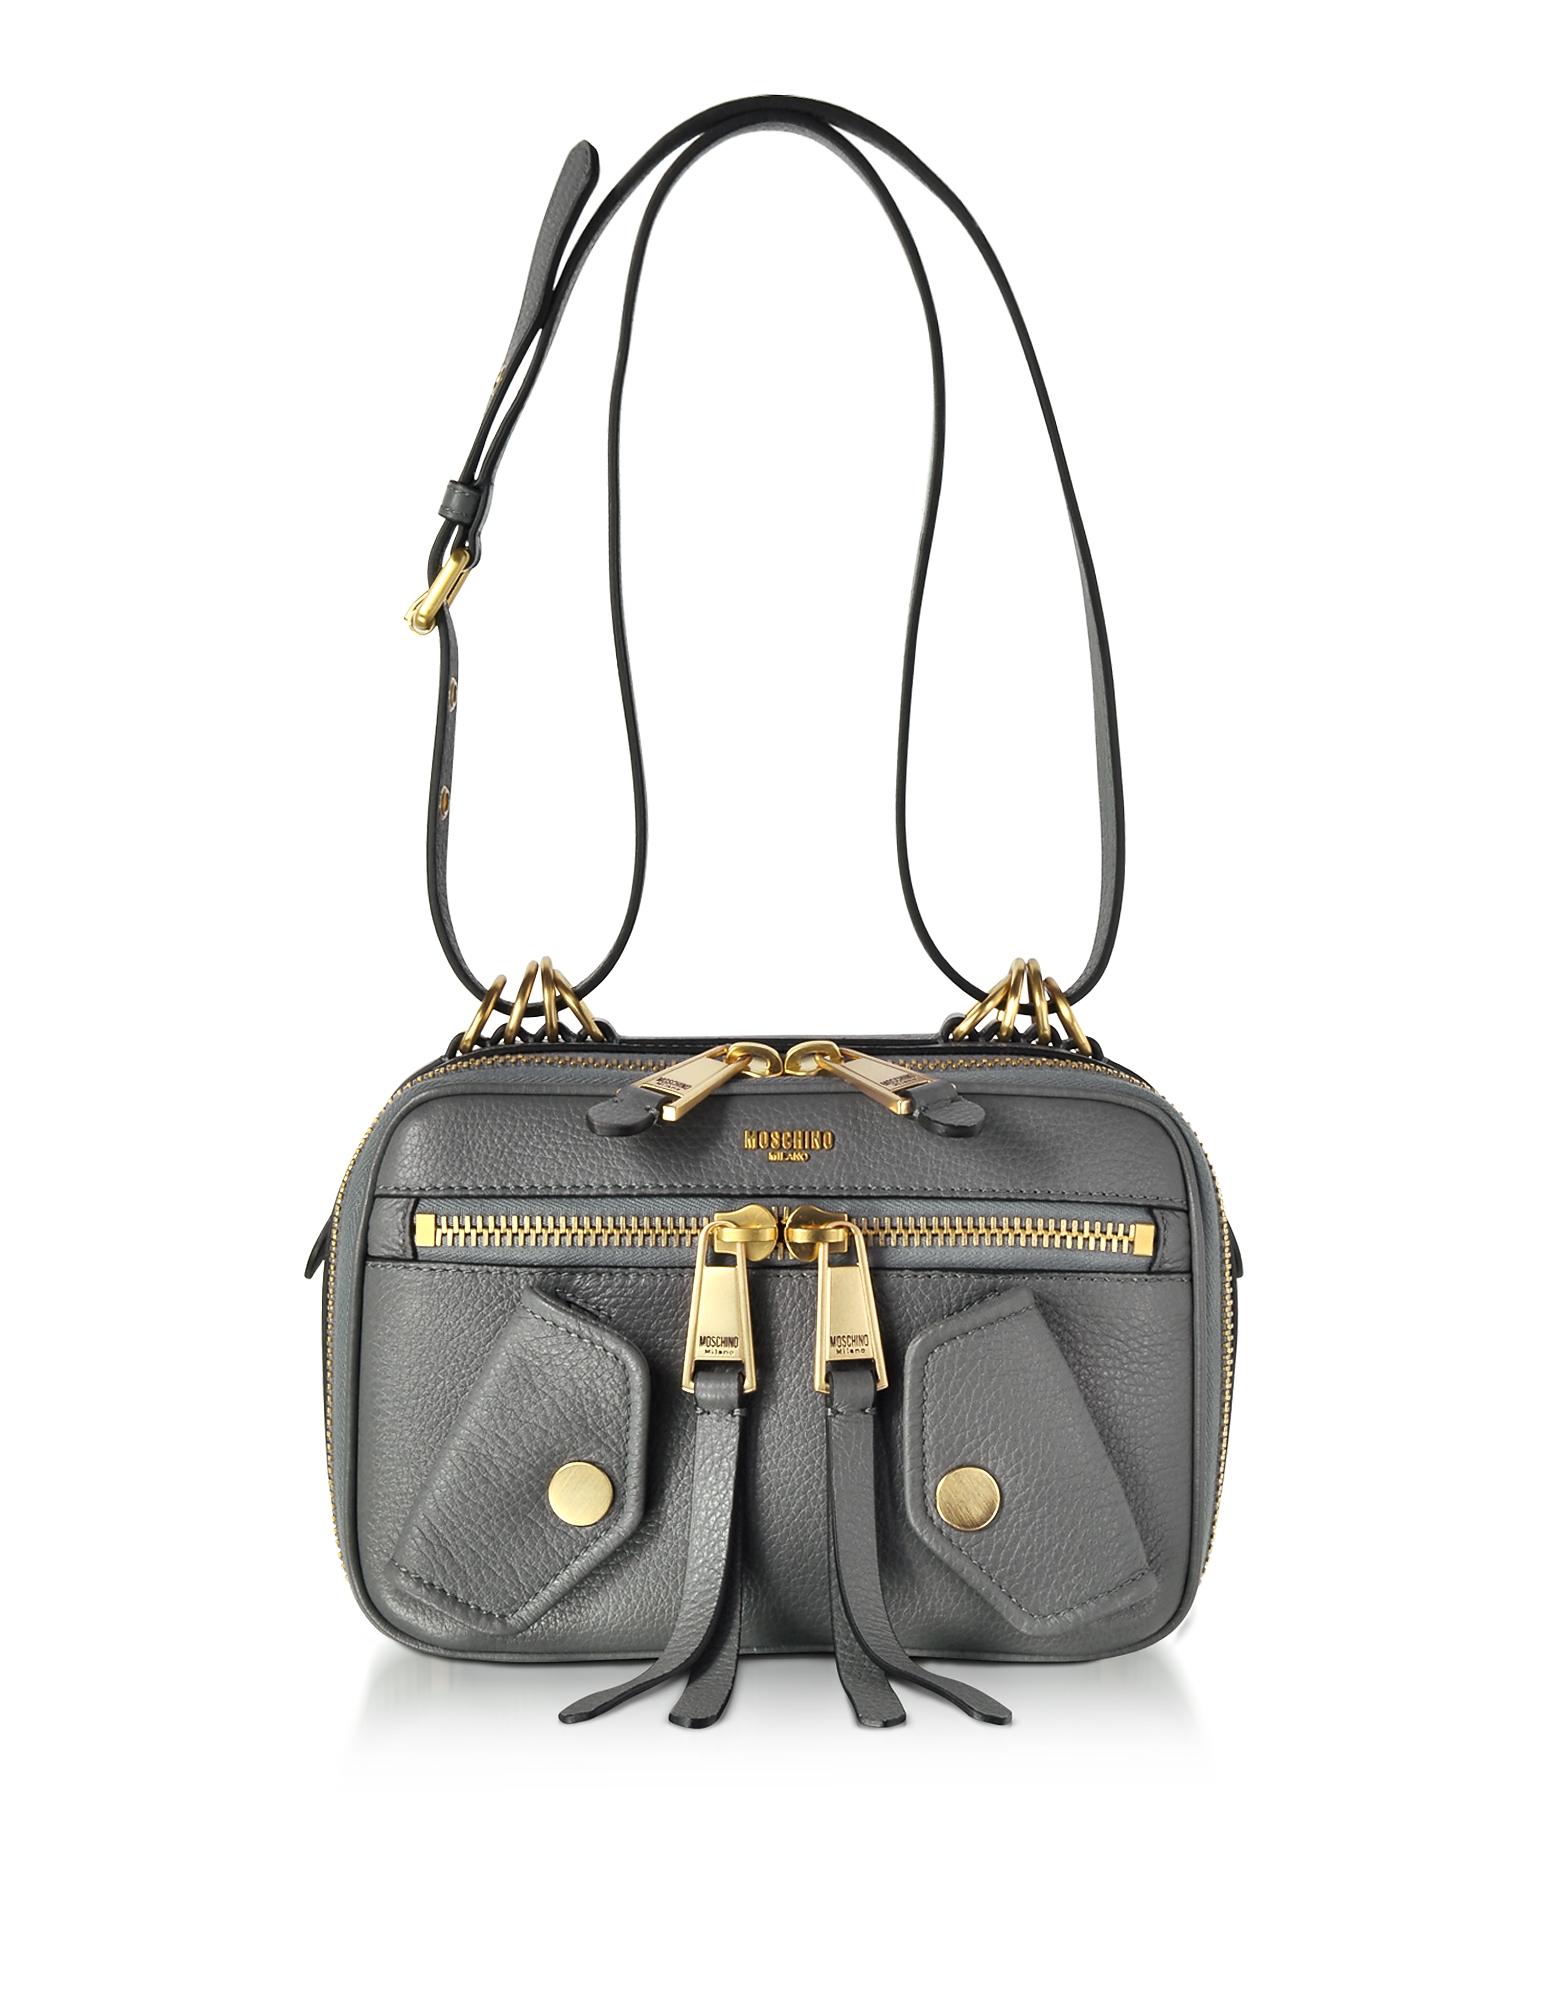 Moschino Handbags, Dark Gray Leather Shoulder Bag